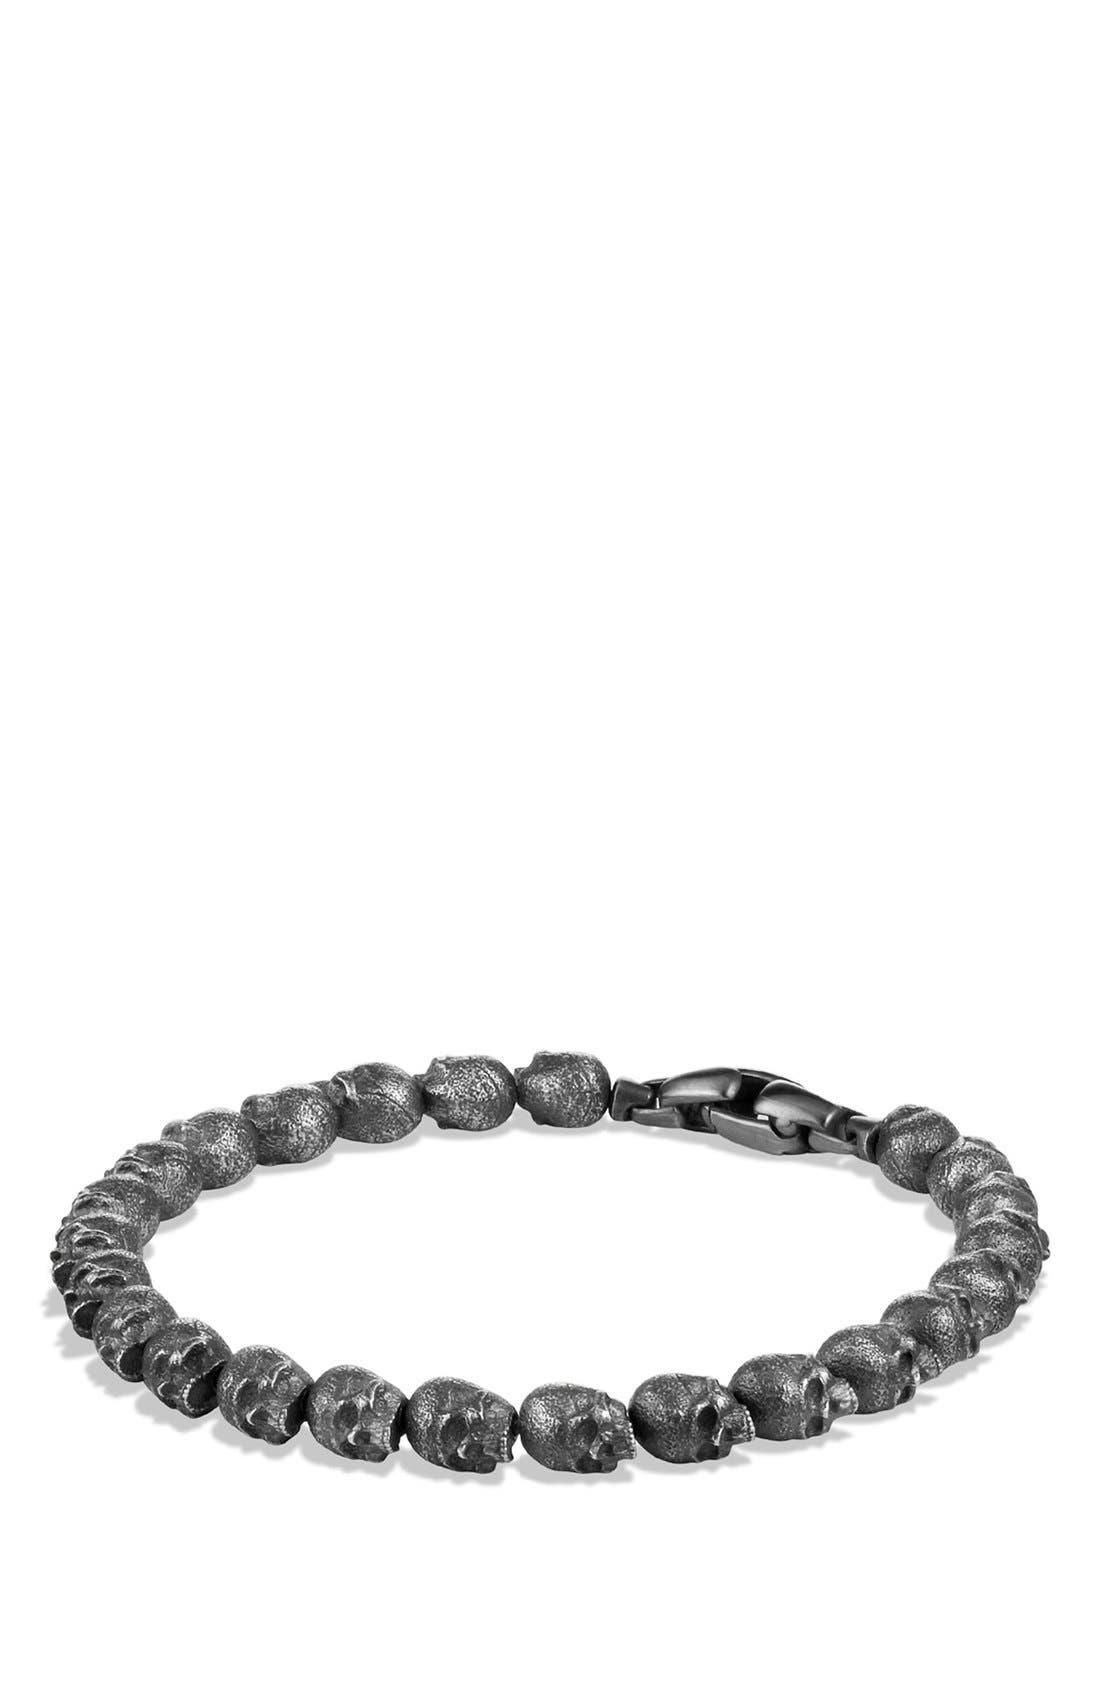 'Spiritual Beads' Bracelet in Silver,                         Main,                         color, Silver